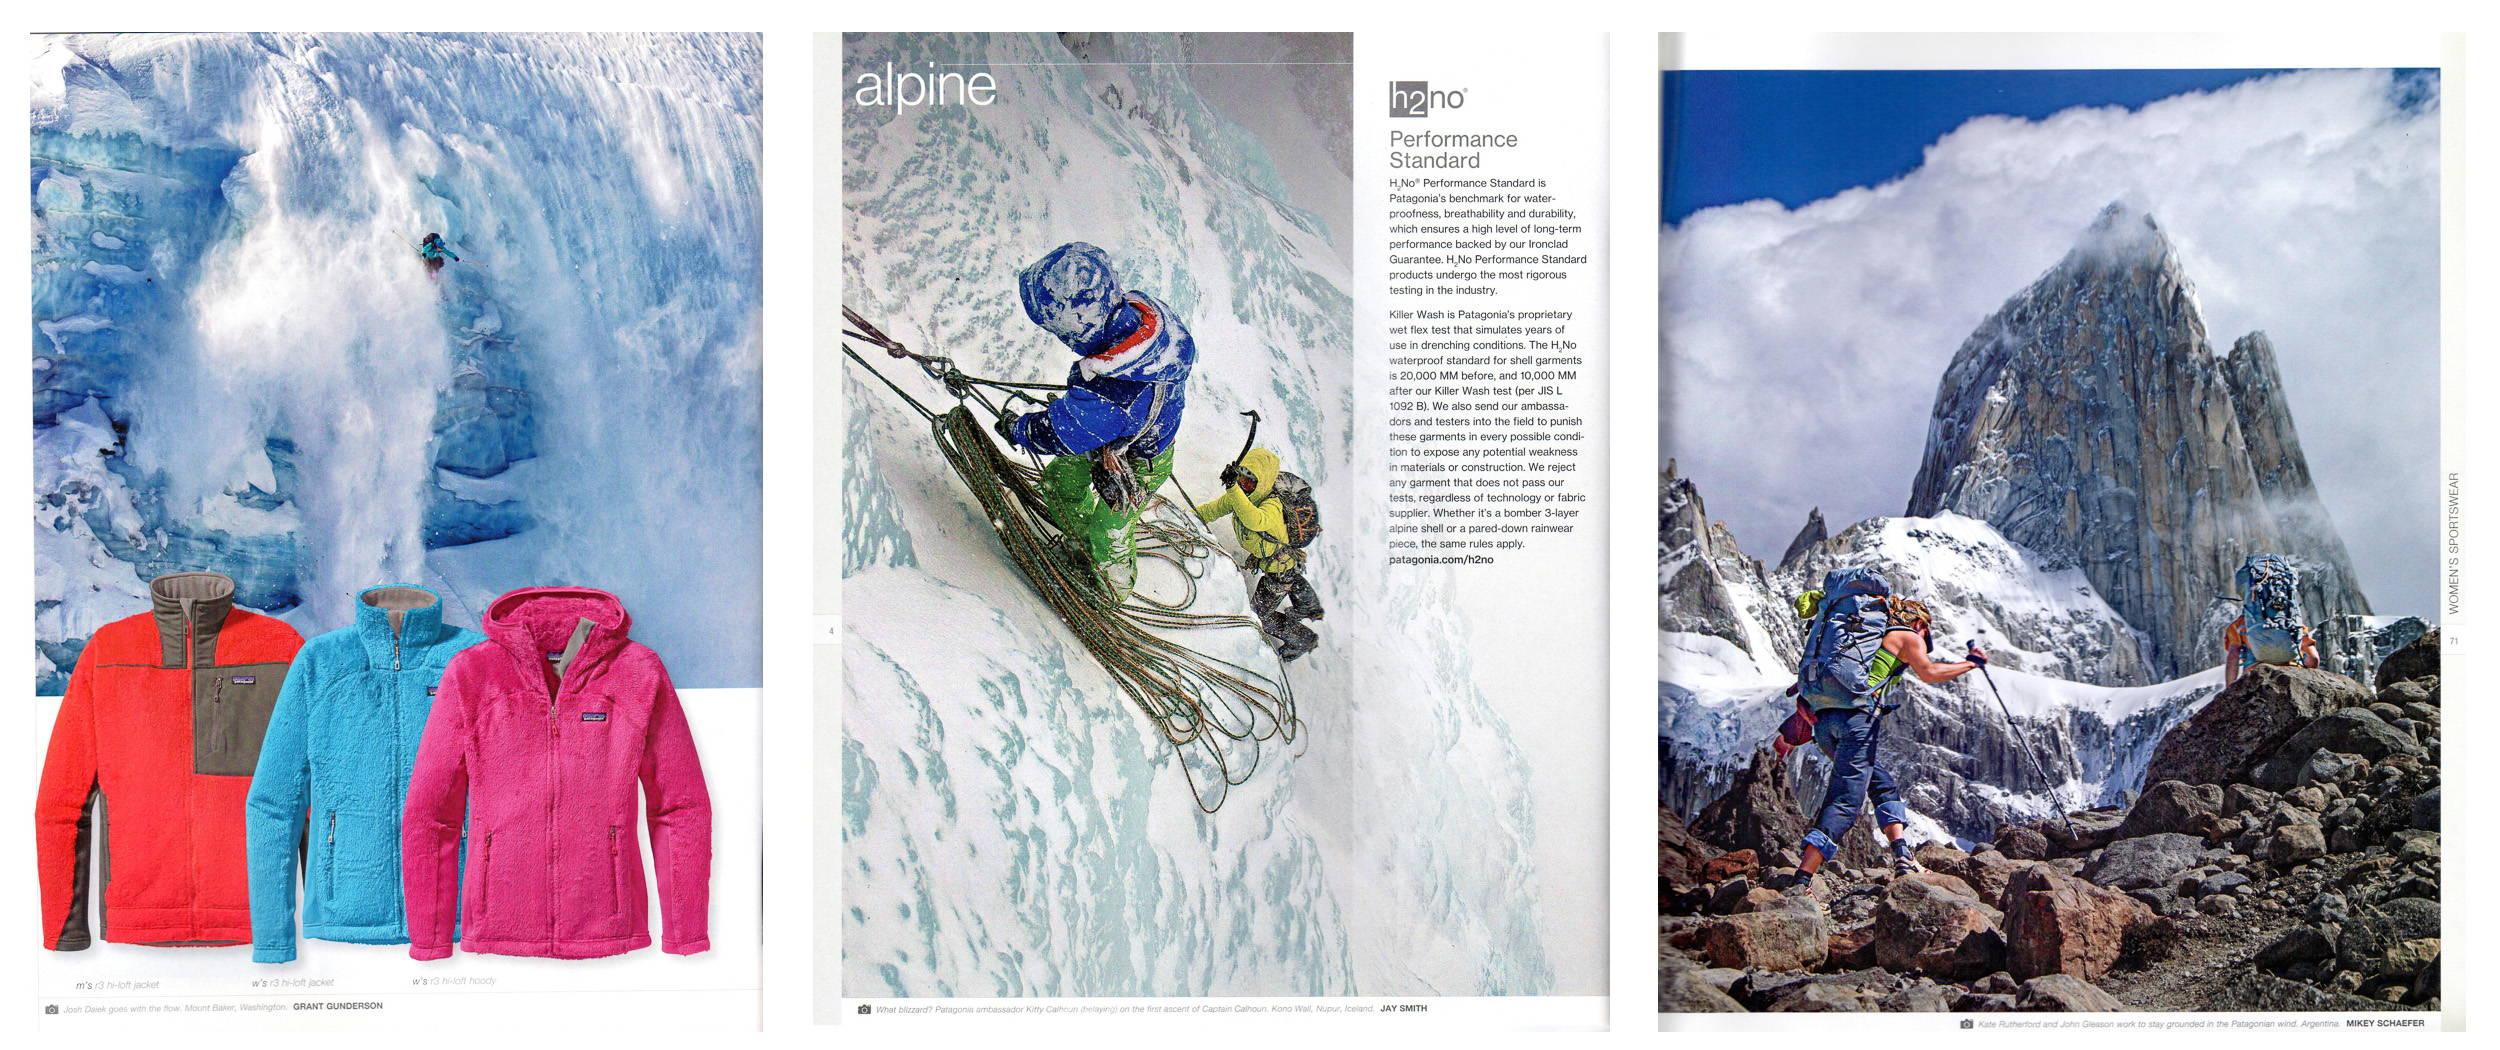 Patagonia Catalog Holiday 2012, p.16; Patagonia Alpine 2012, p.4; Patagonia Alpine 2012, p.71